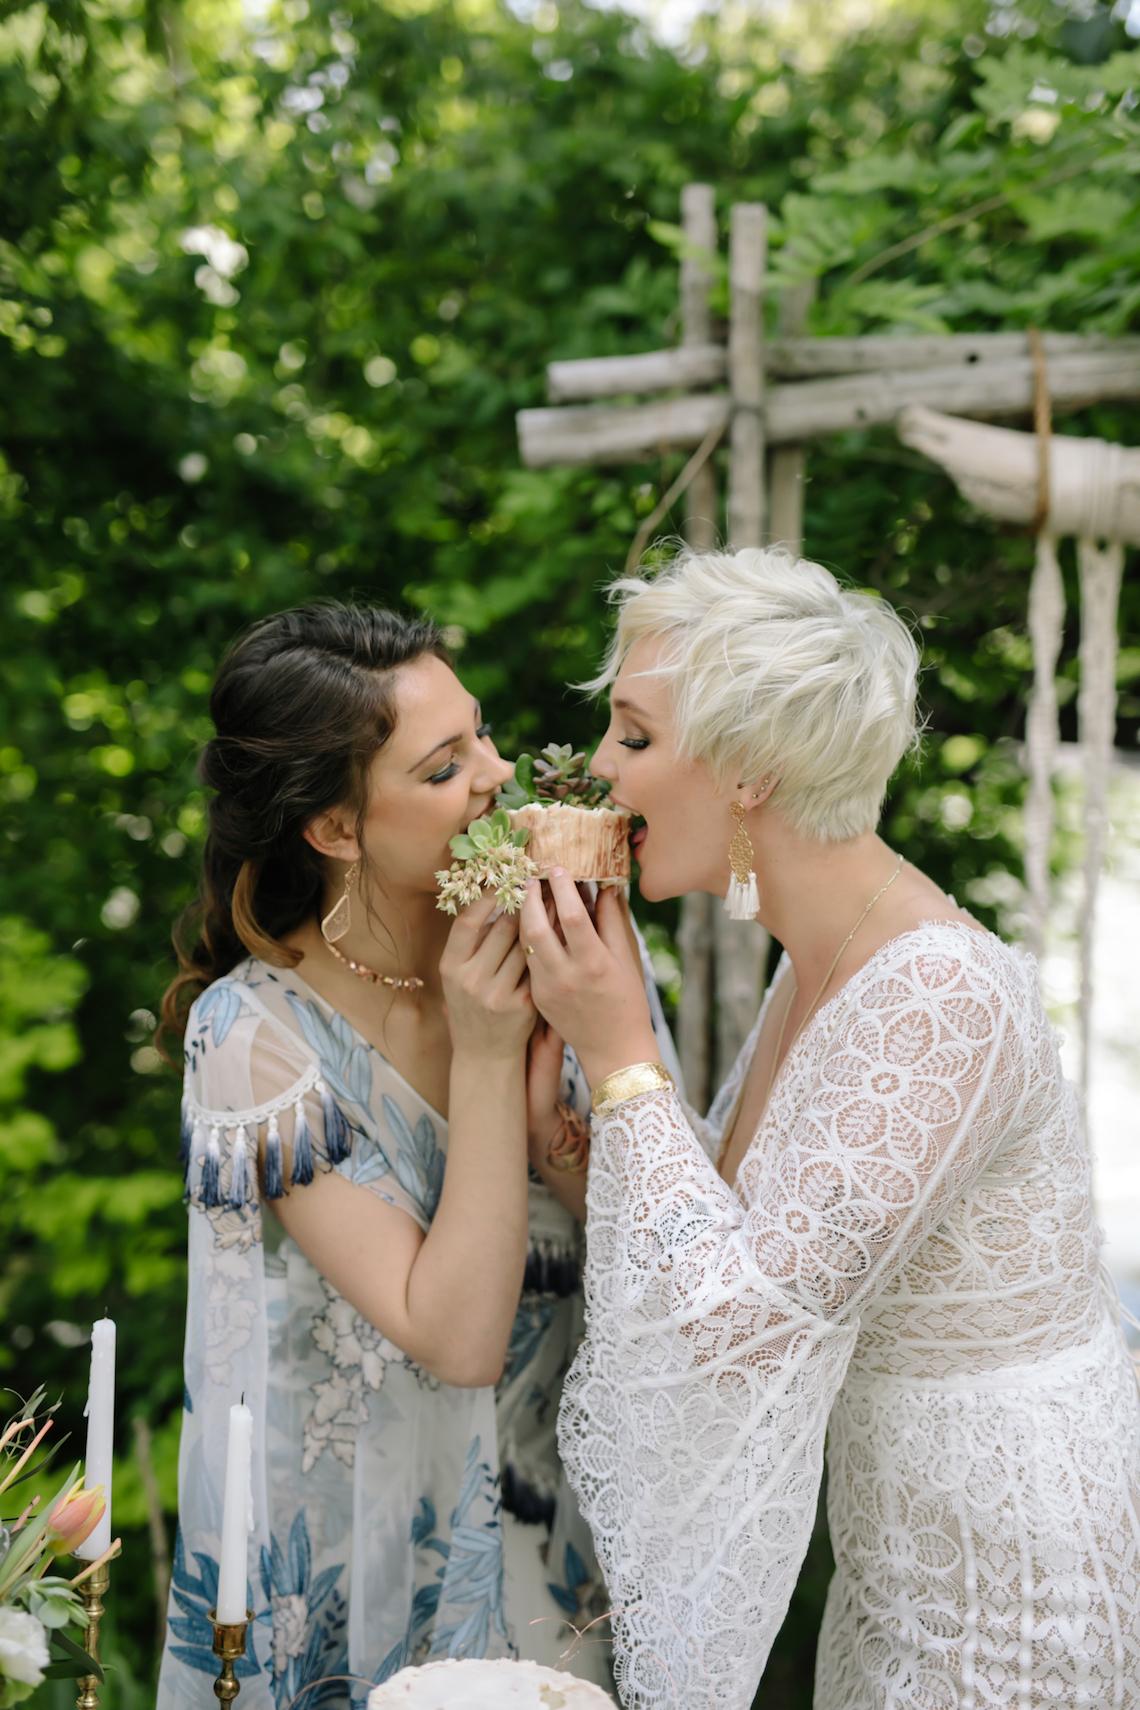 Dreamcatcher Bohemian Wedding Inspiration – Gissell Weddings – Corey Fox Photography – Rue de Seine Bridal 32